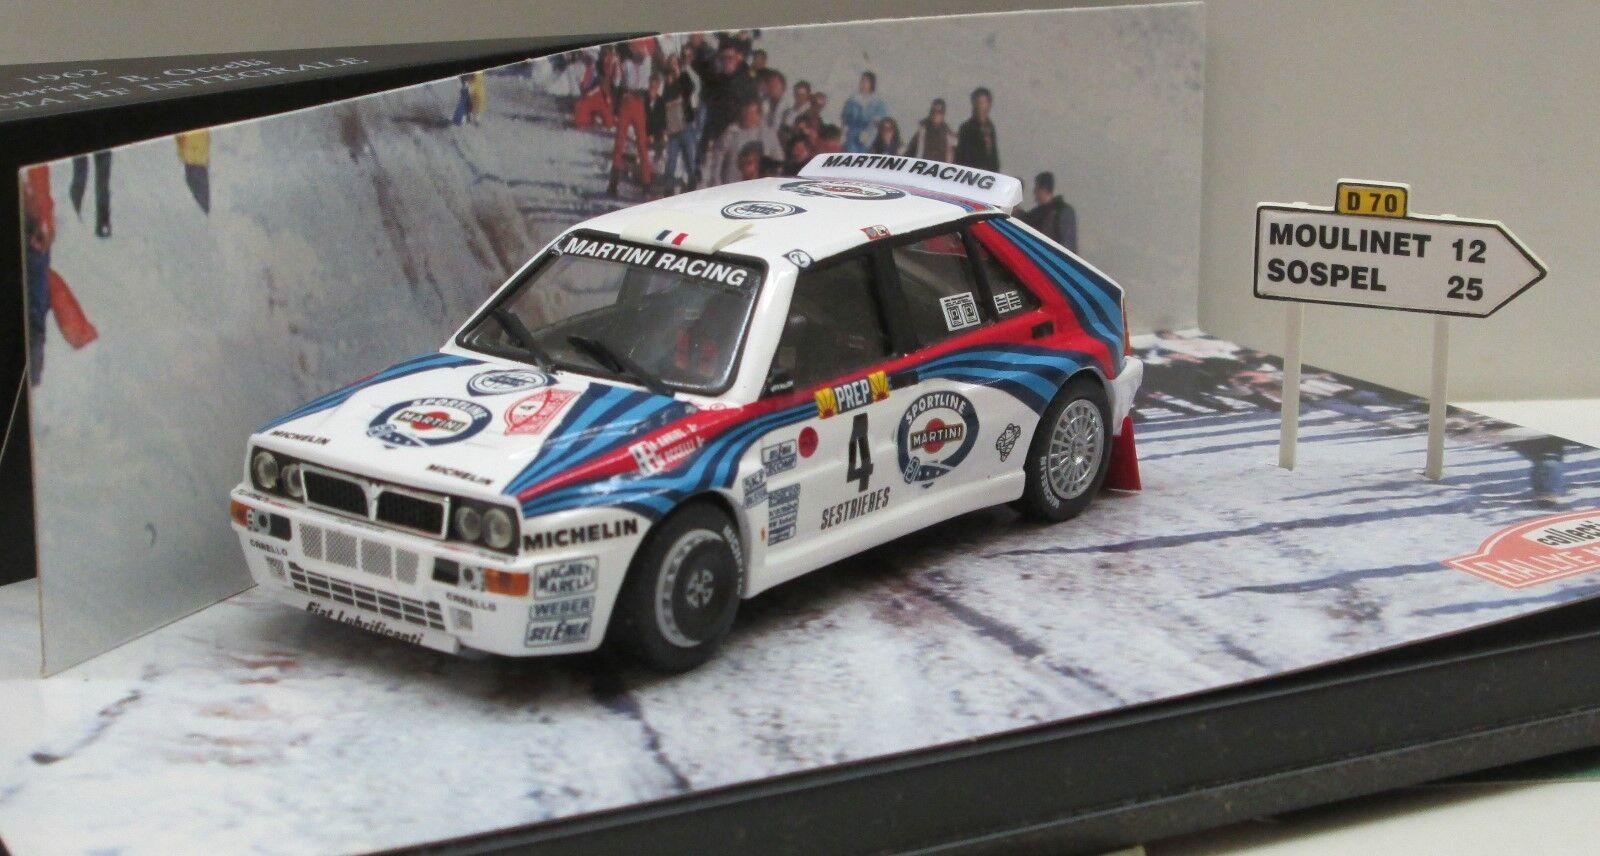 Skid smc007: LANCIA DELTA HF INTEGRALE 16v, Winner Rally Monte Carlo 1992